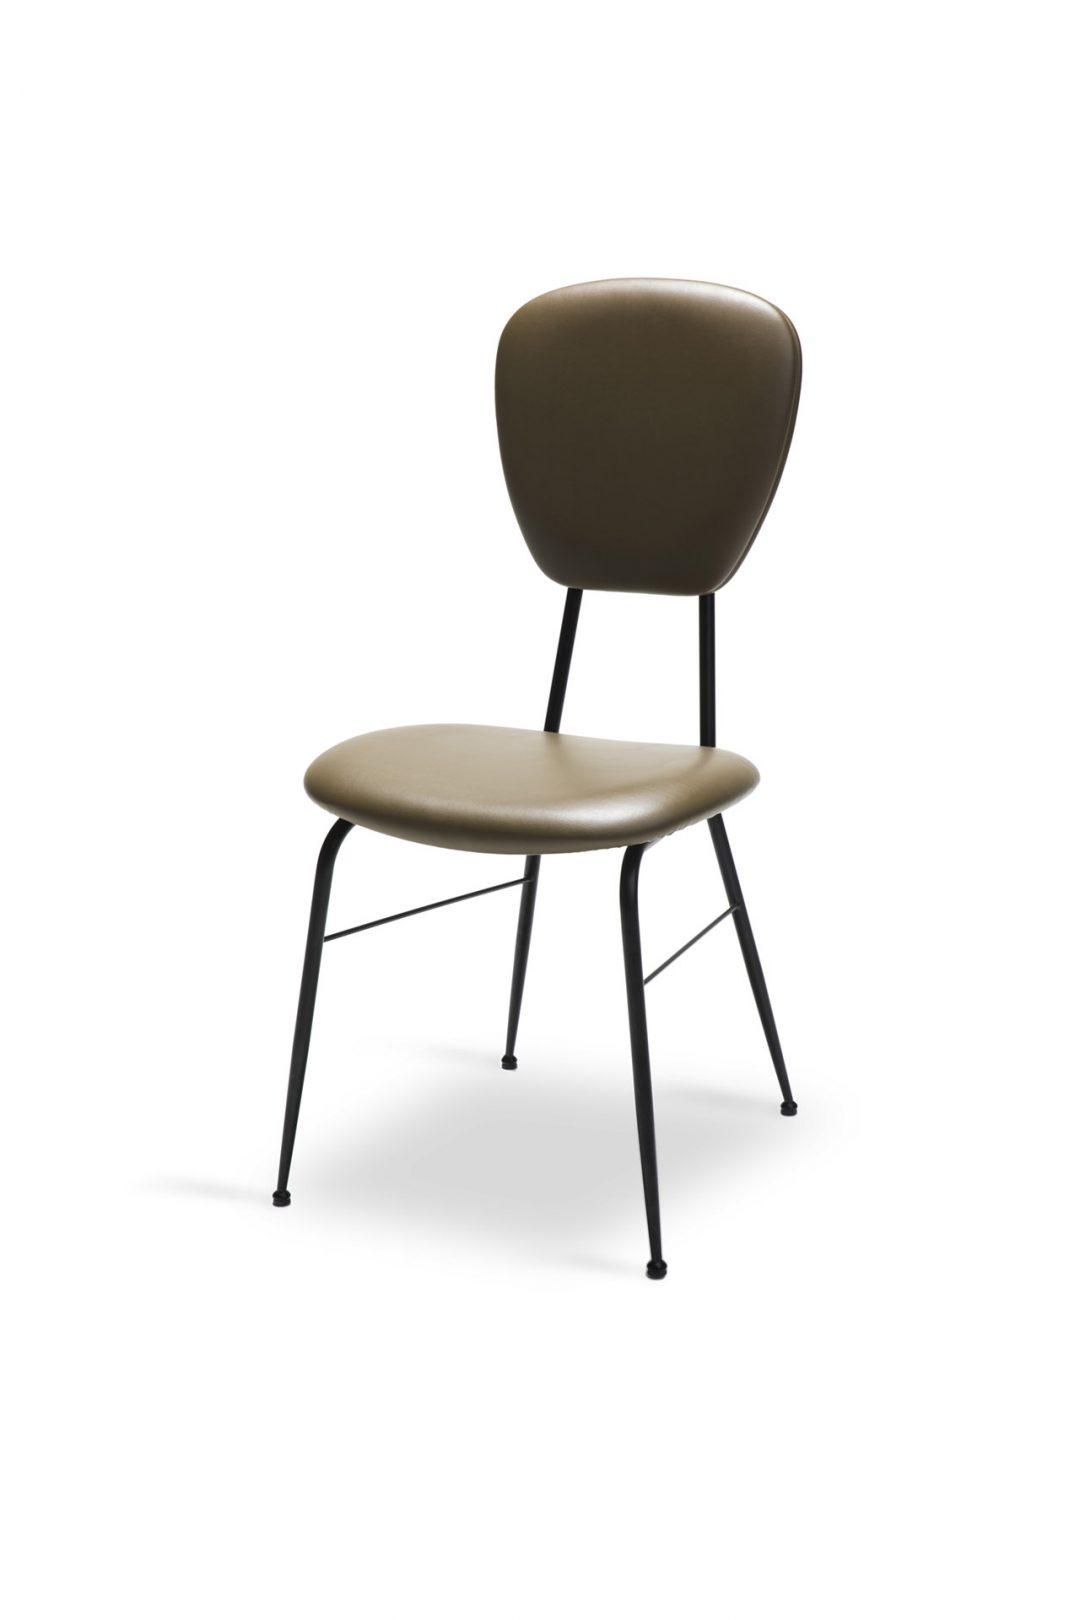 sedia elegante color chiaro chic 4